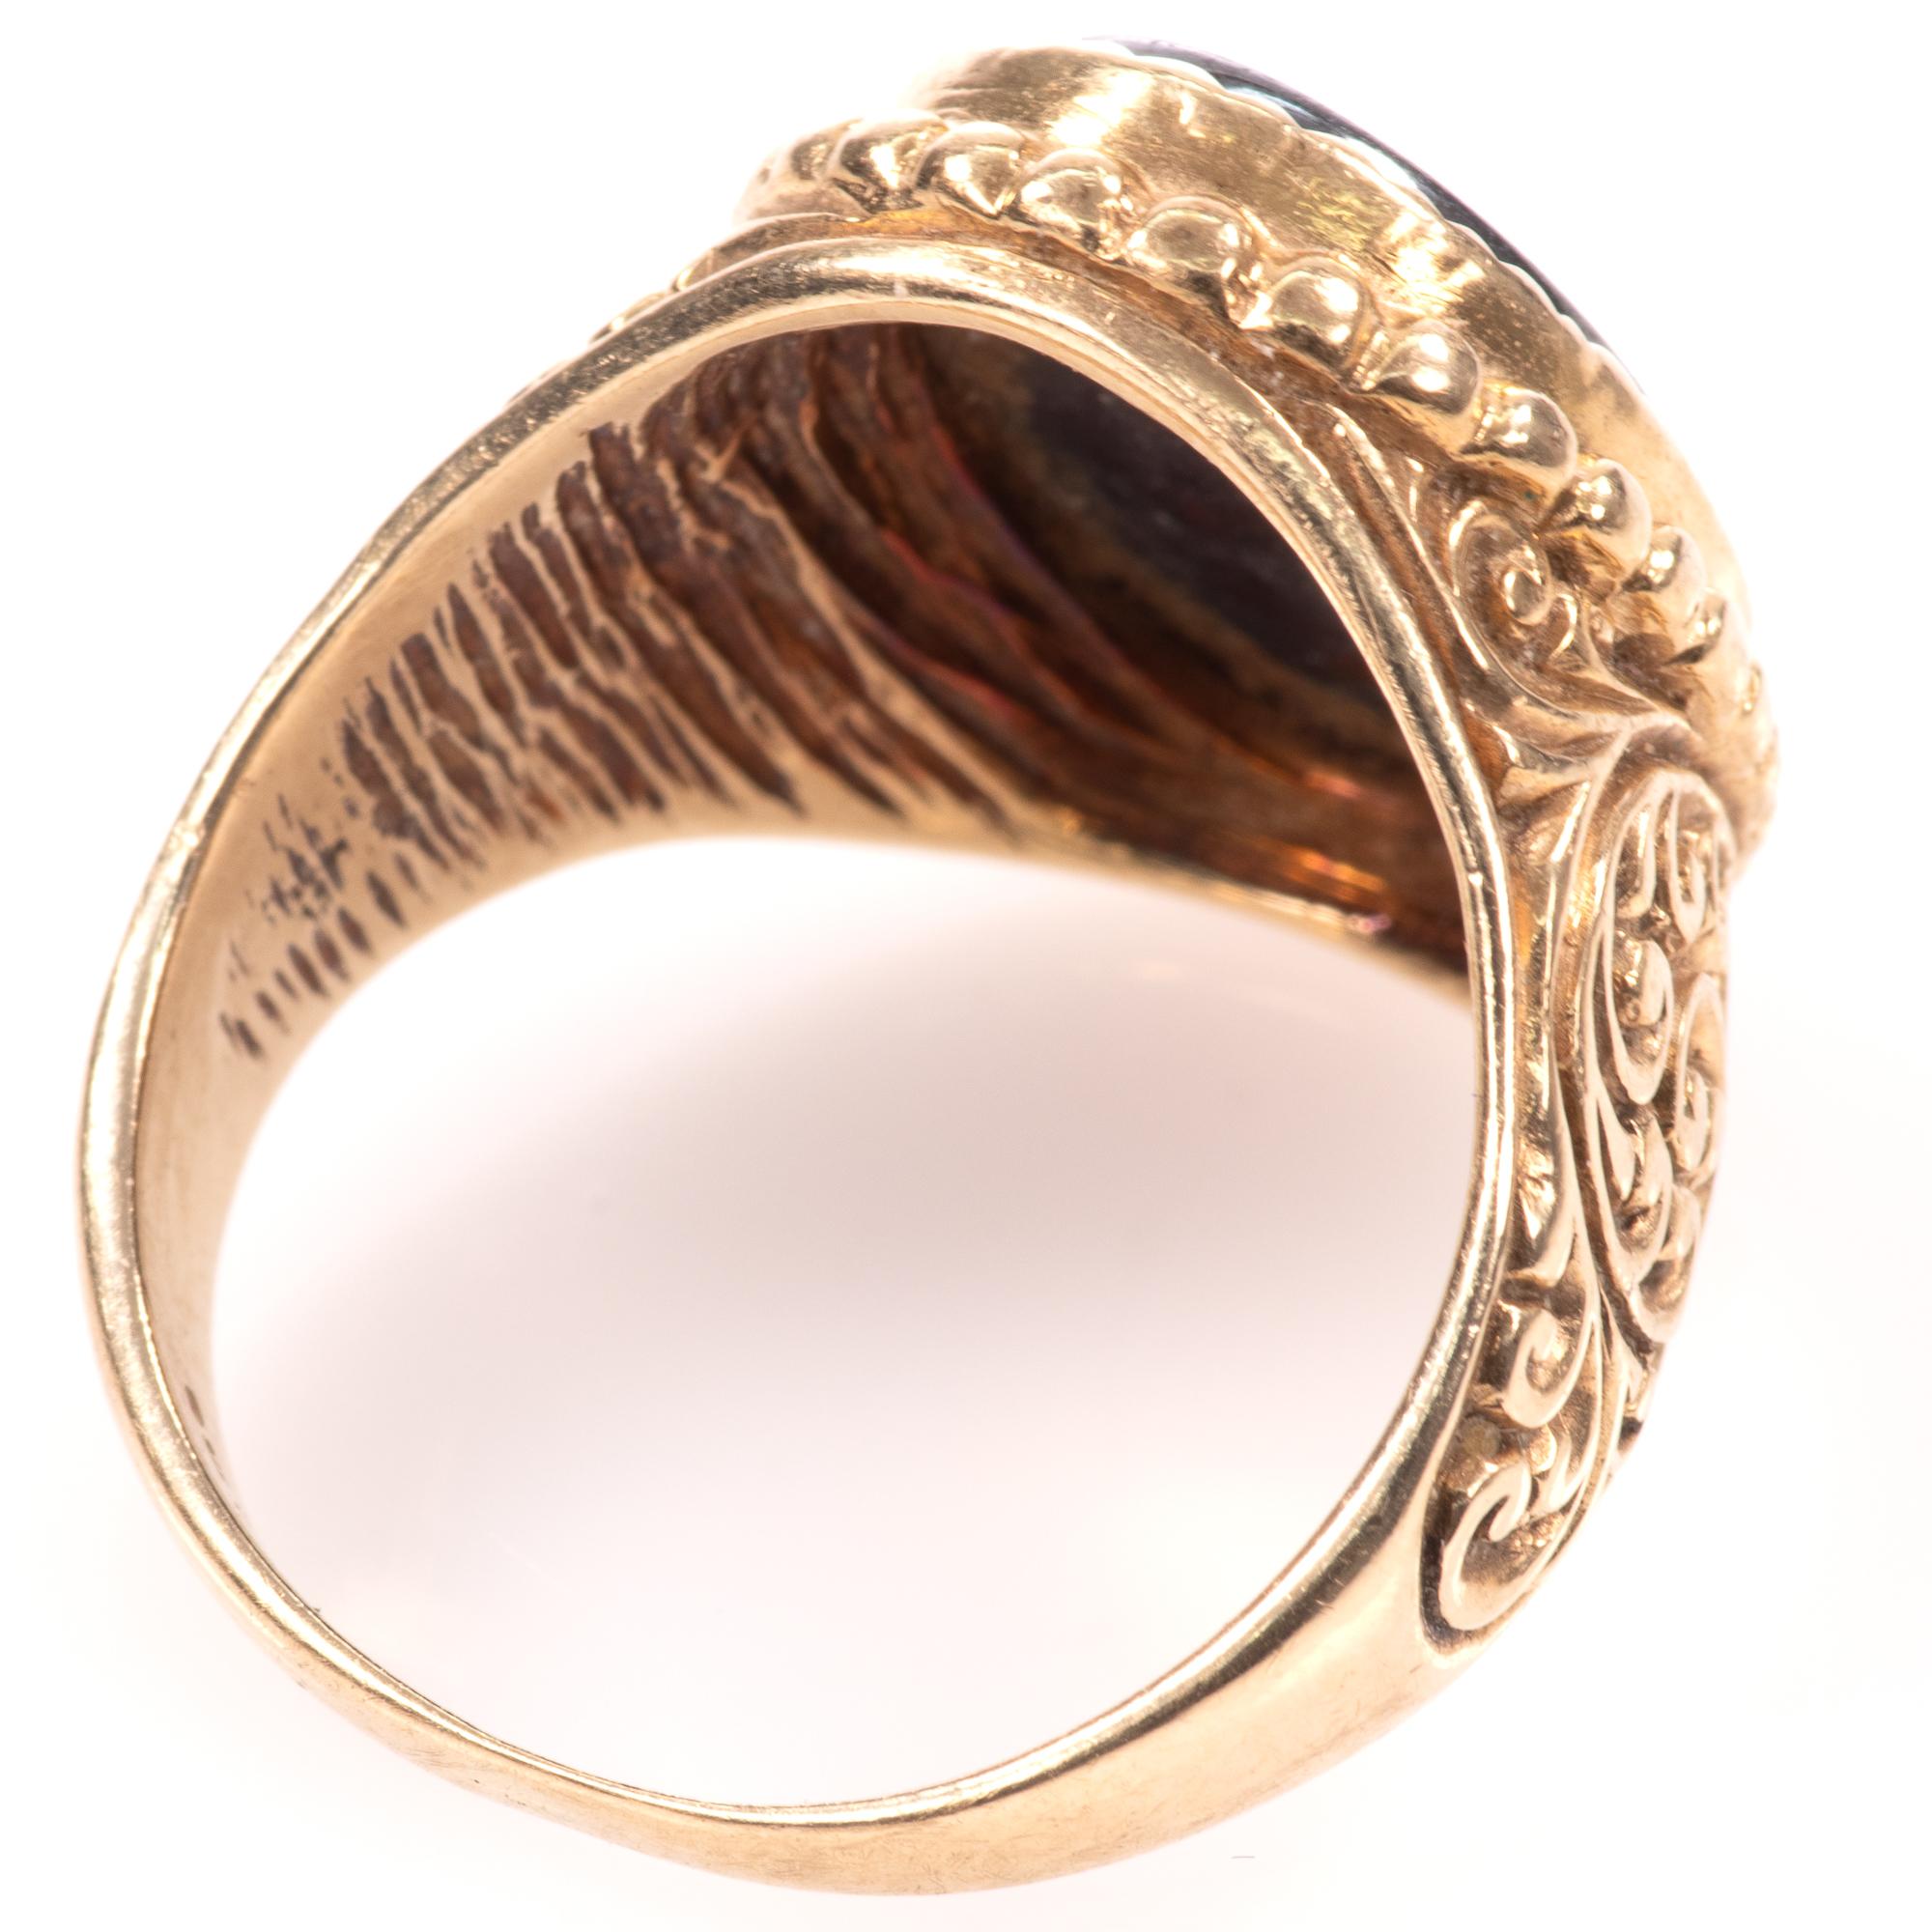 9ct Gold Centurion Onyx Signet Ring - Image 5 of 7